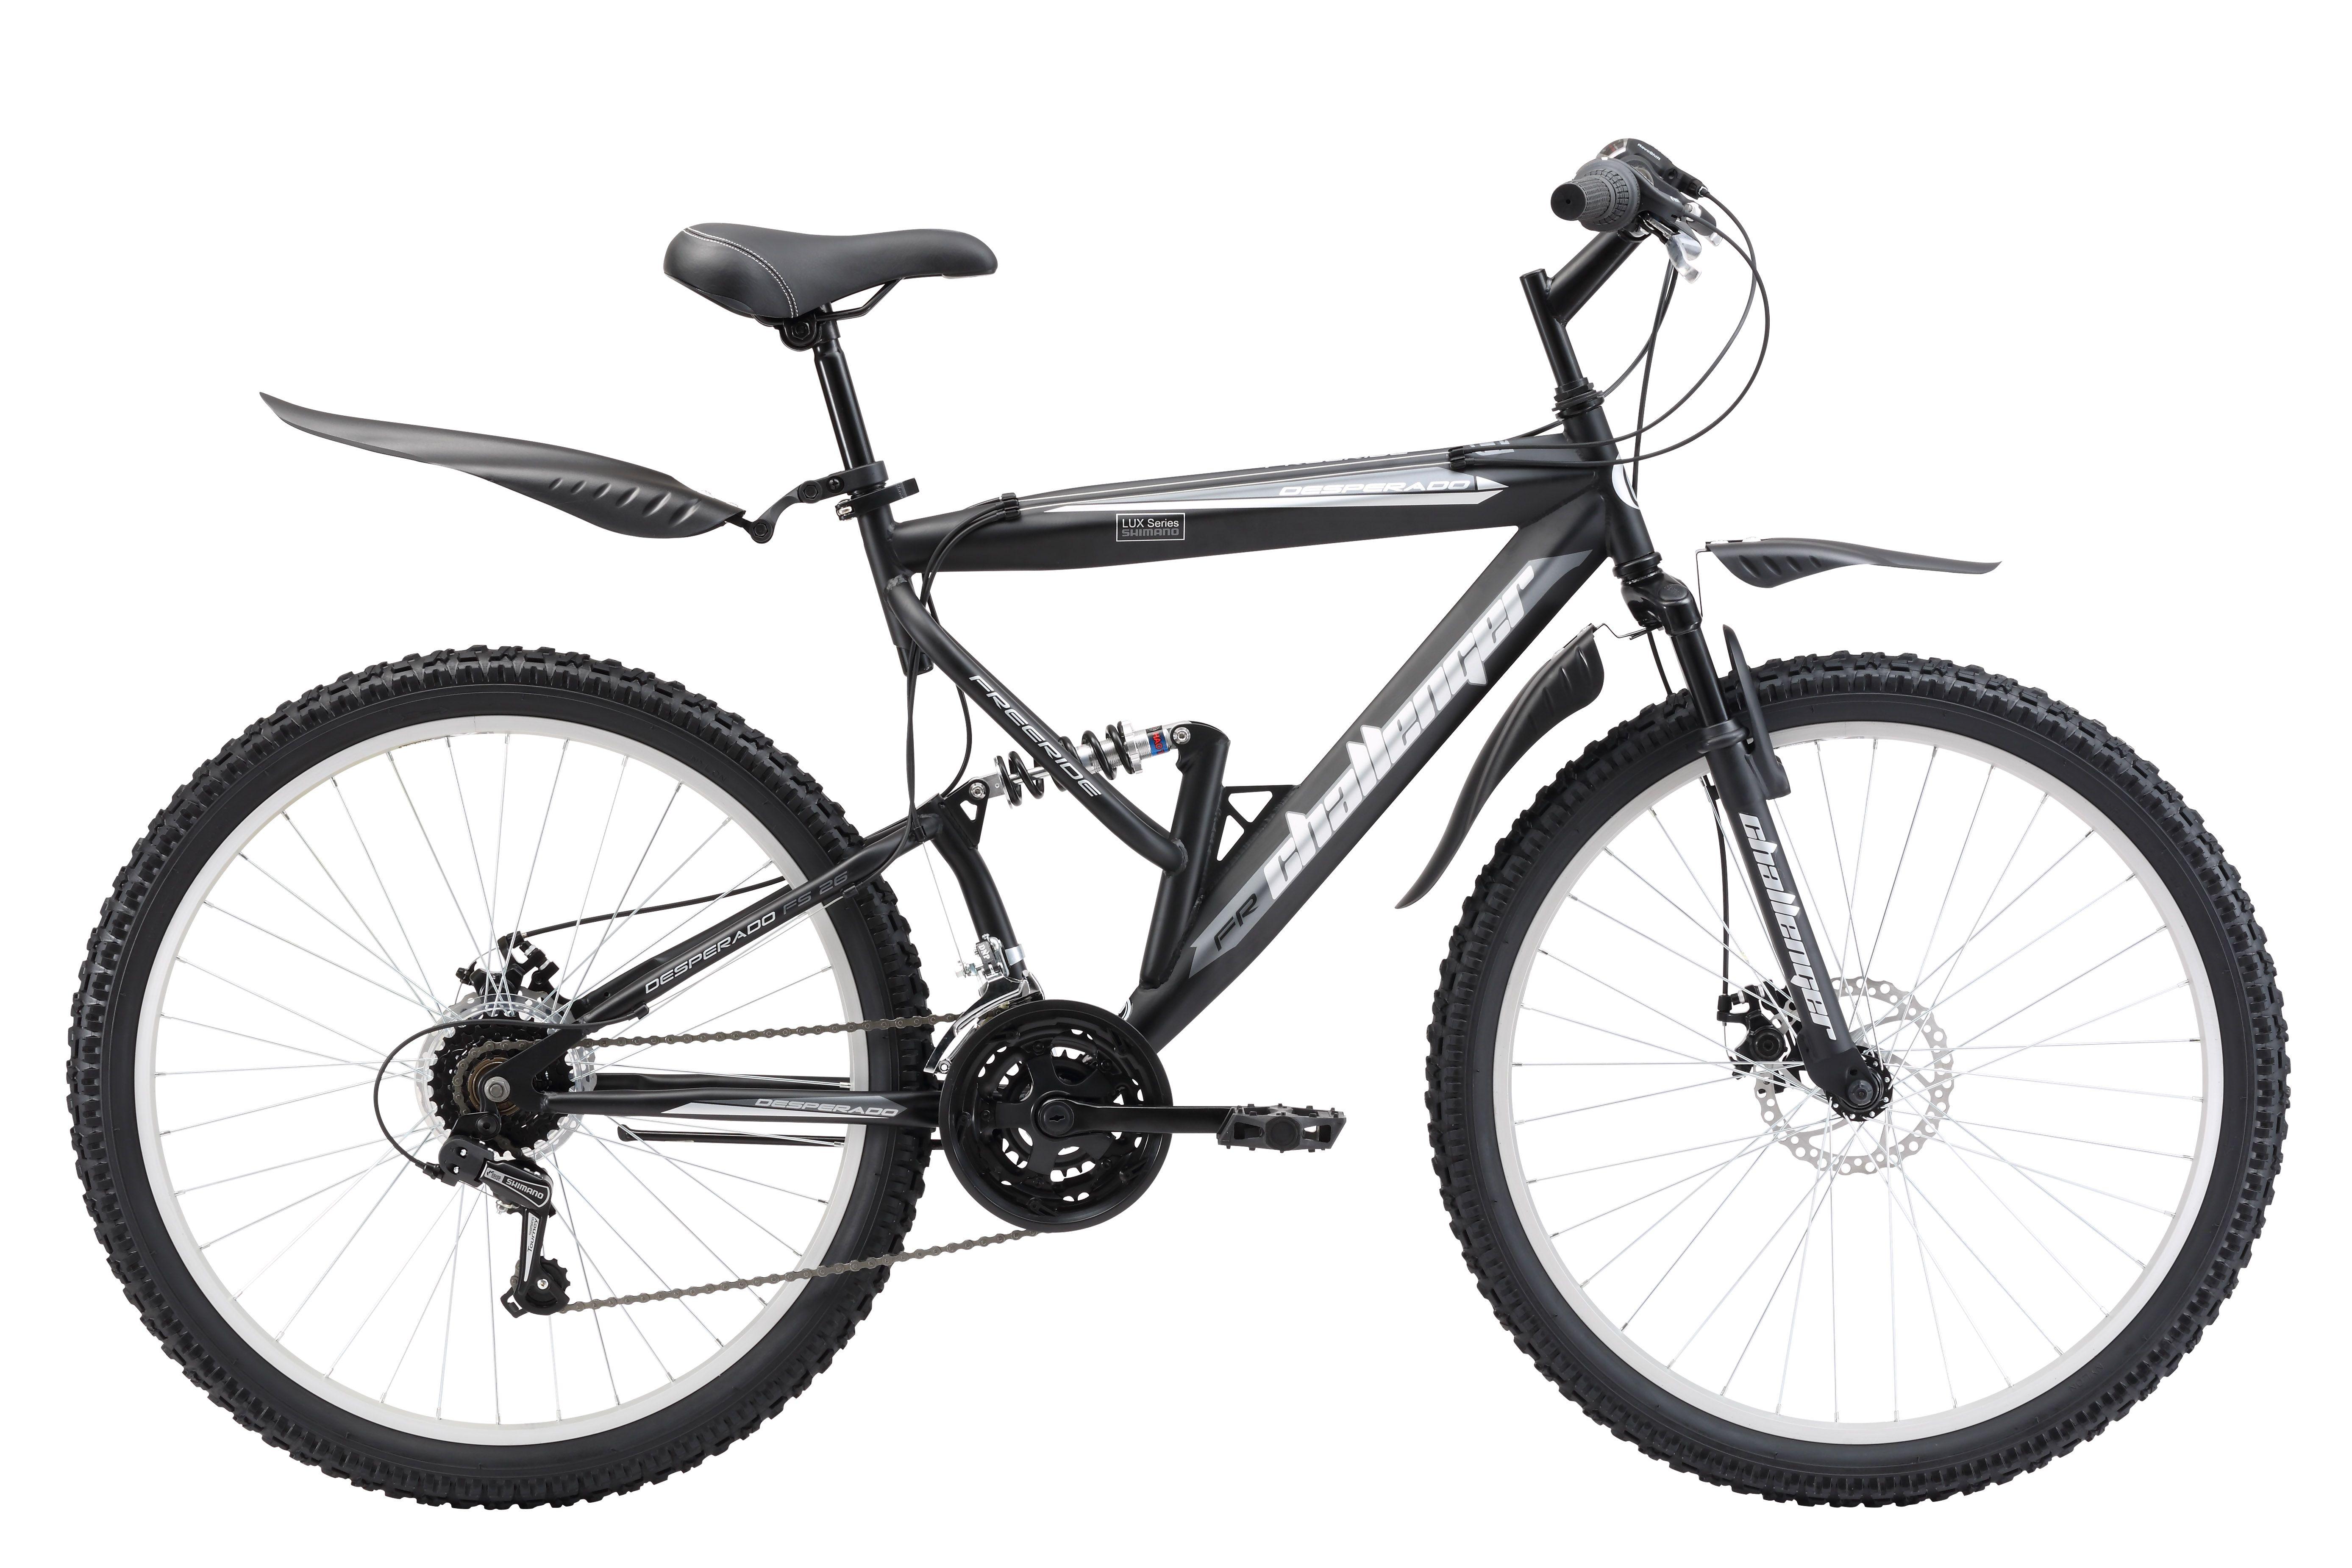 Велосипед Challenger Desperado Lux FS 26 D 2017 черно-серый 16 д